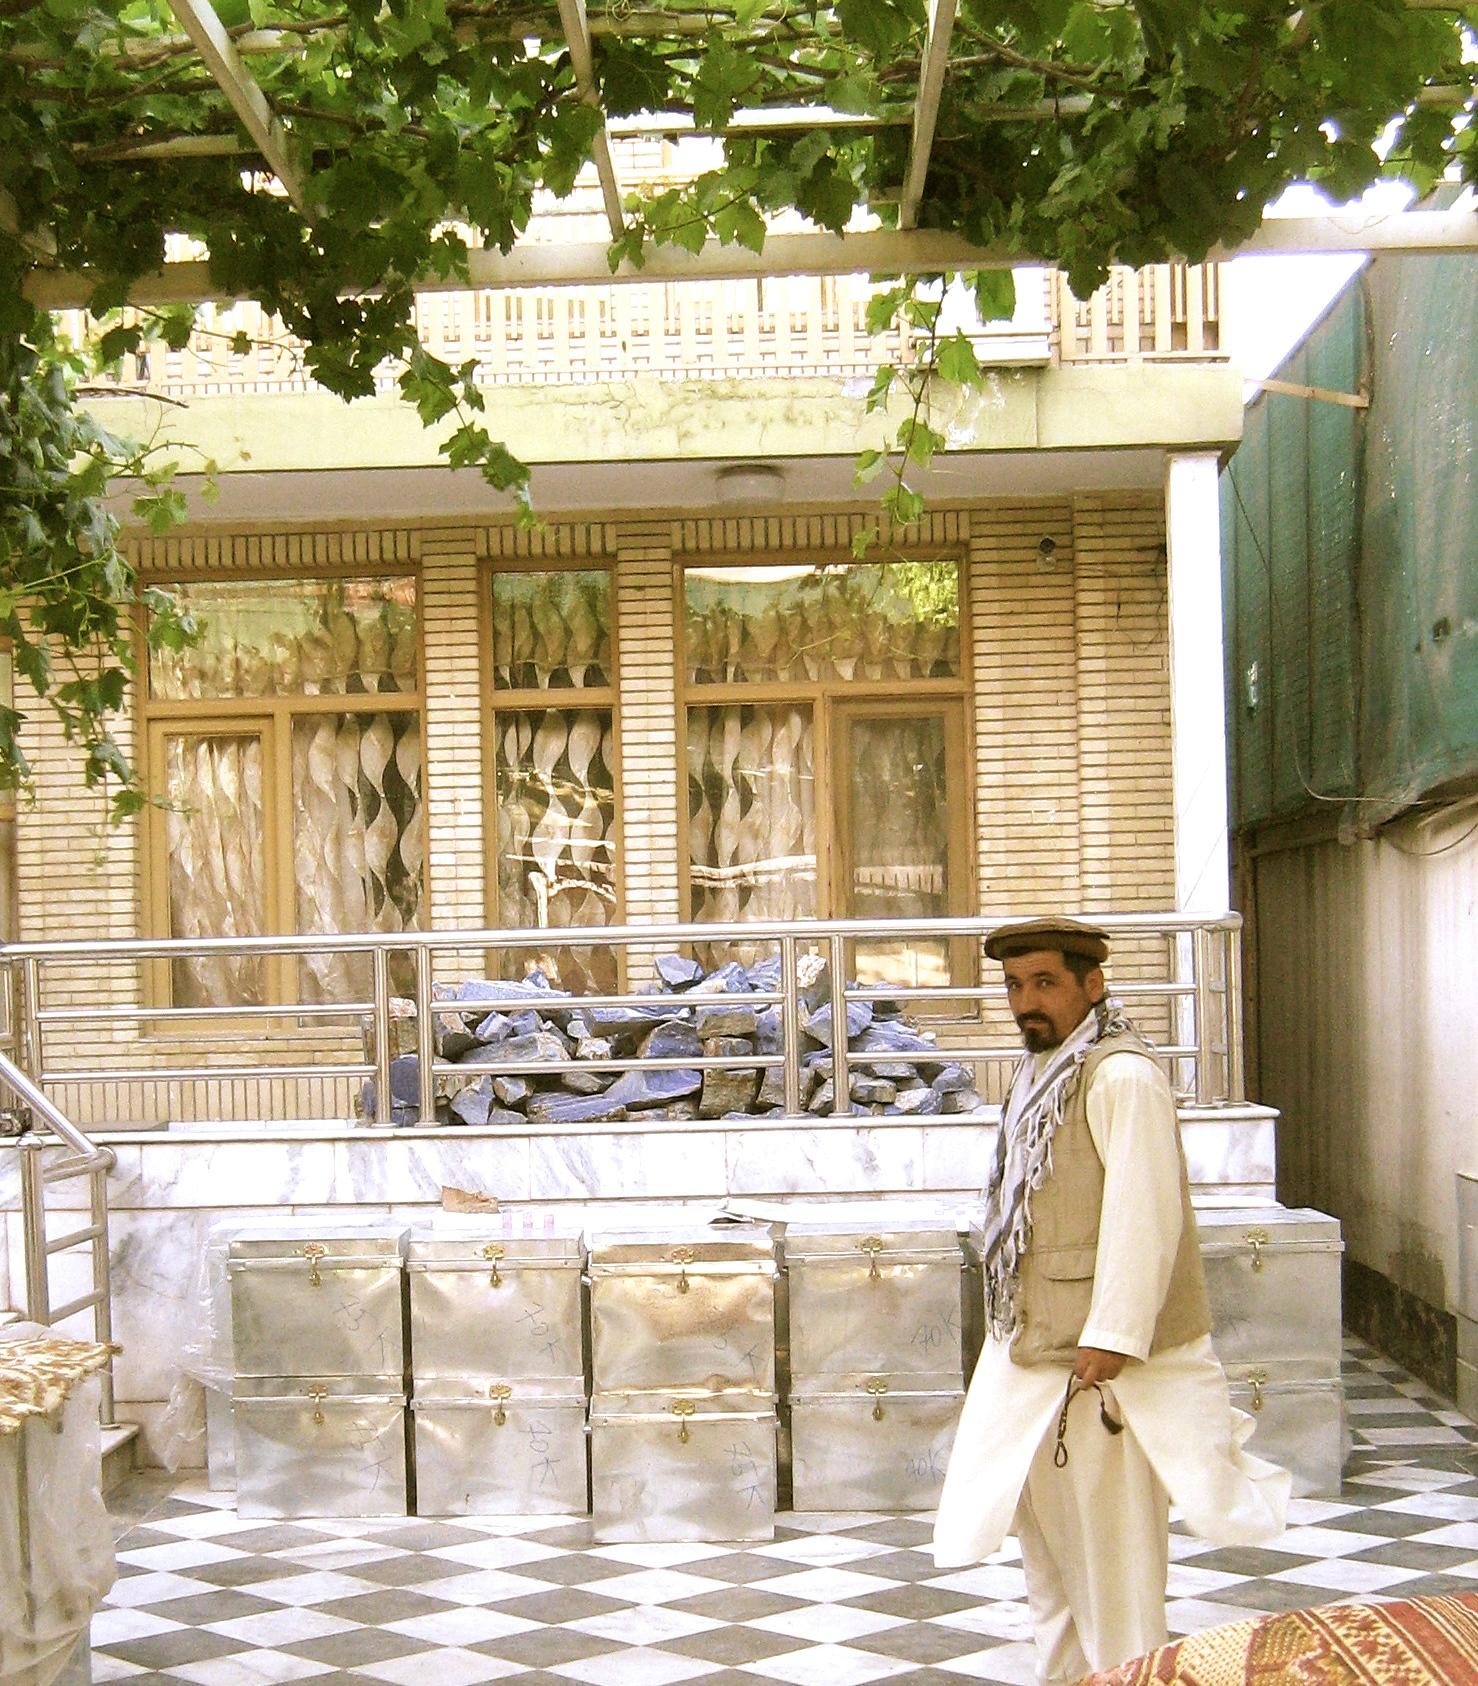 A lapis lazuli warehouse in Kabul, Afghanistan. Renard Sexton, April 2012.